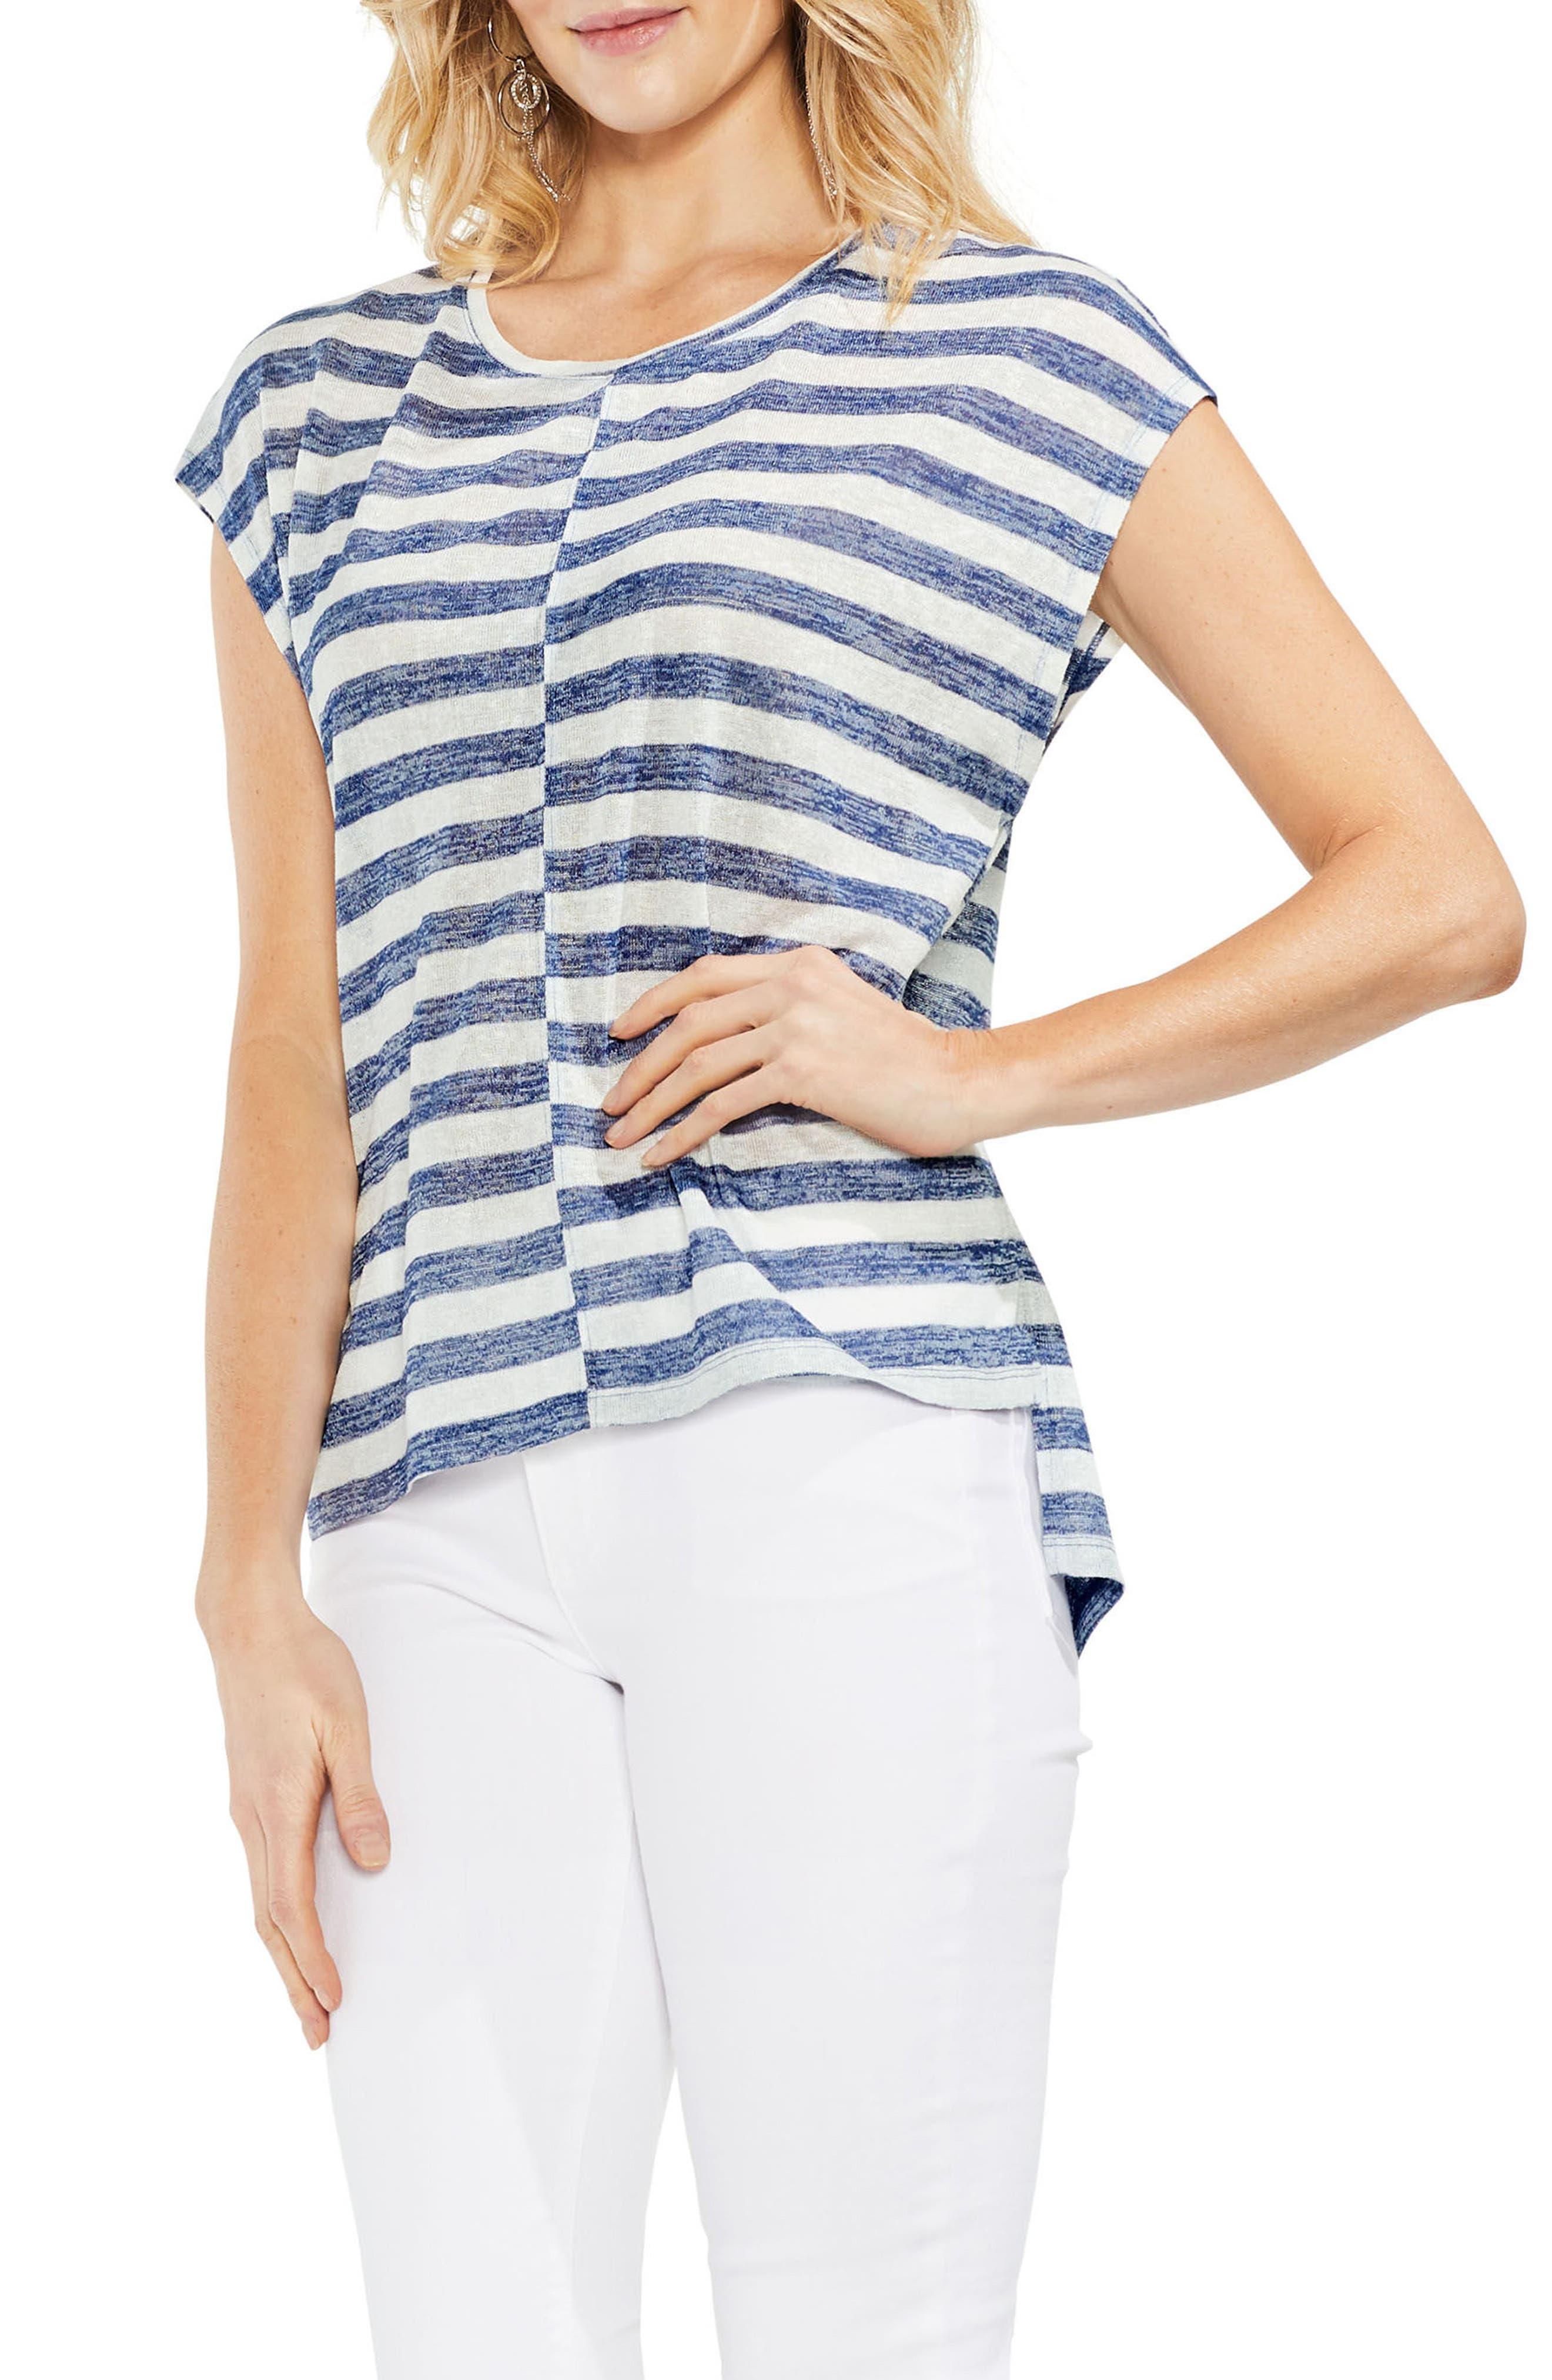 Offset Stripe Top,                         Main,                         color, High Tide